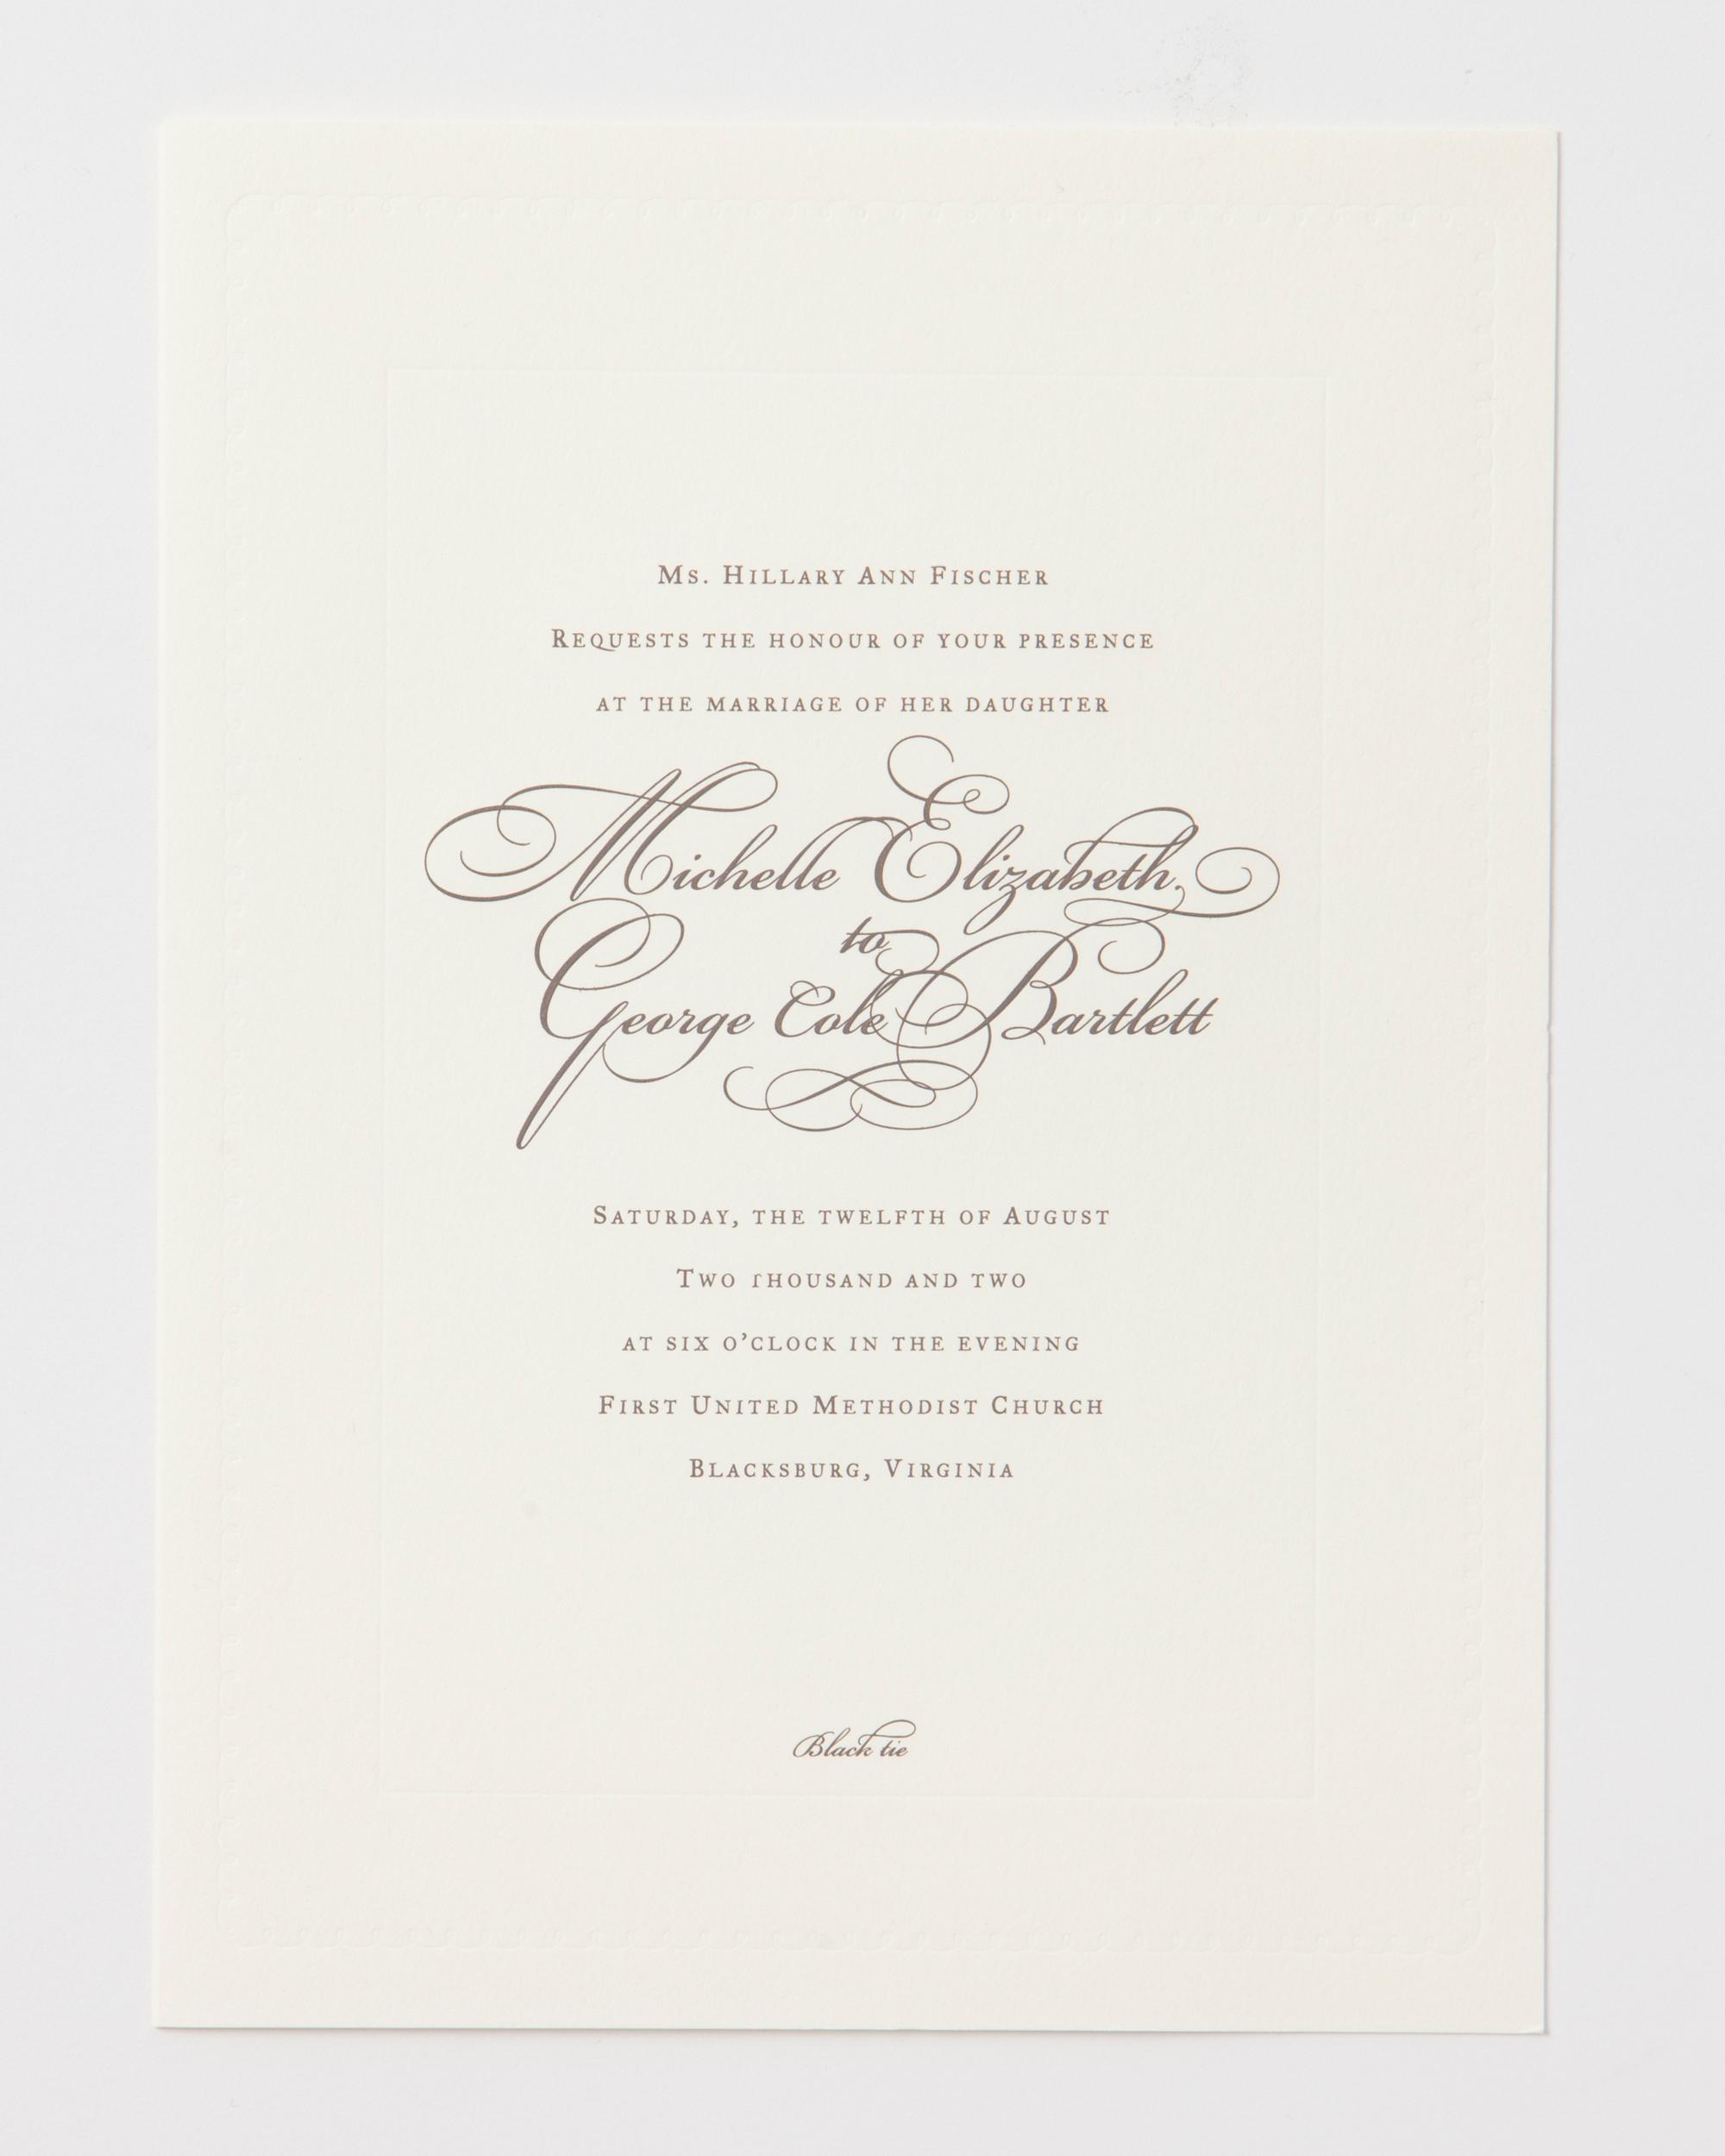 host-lines-weddings-stationery-4-single-parent-0529-d111607-1014.jpg